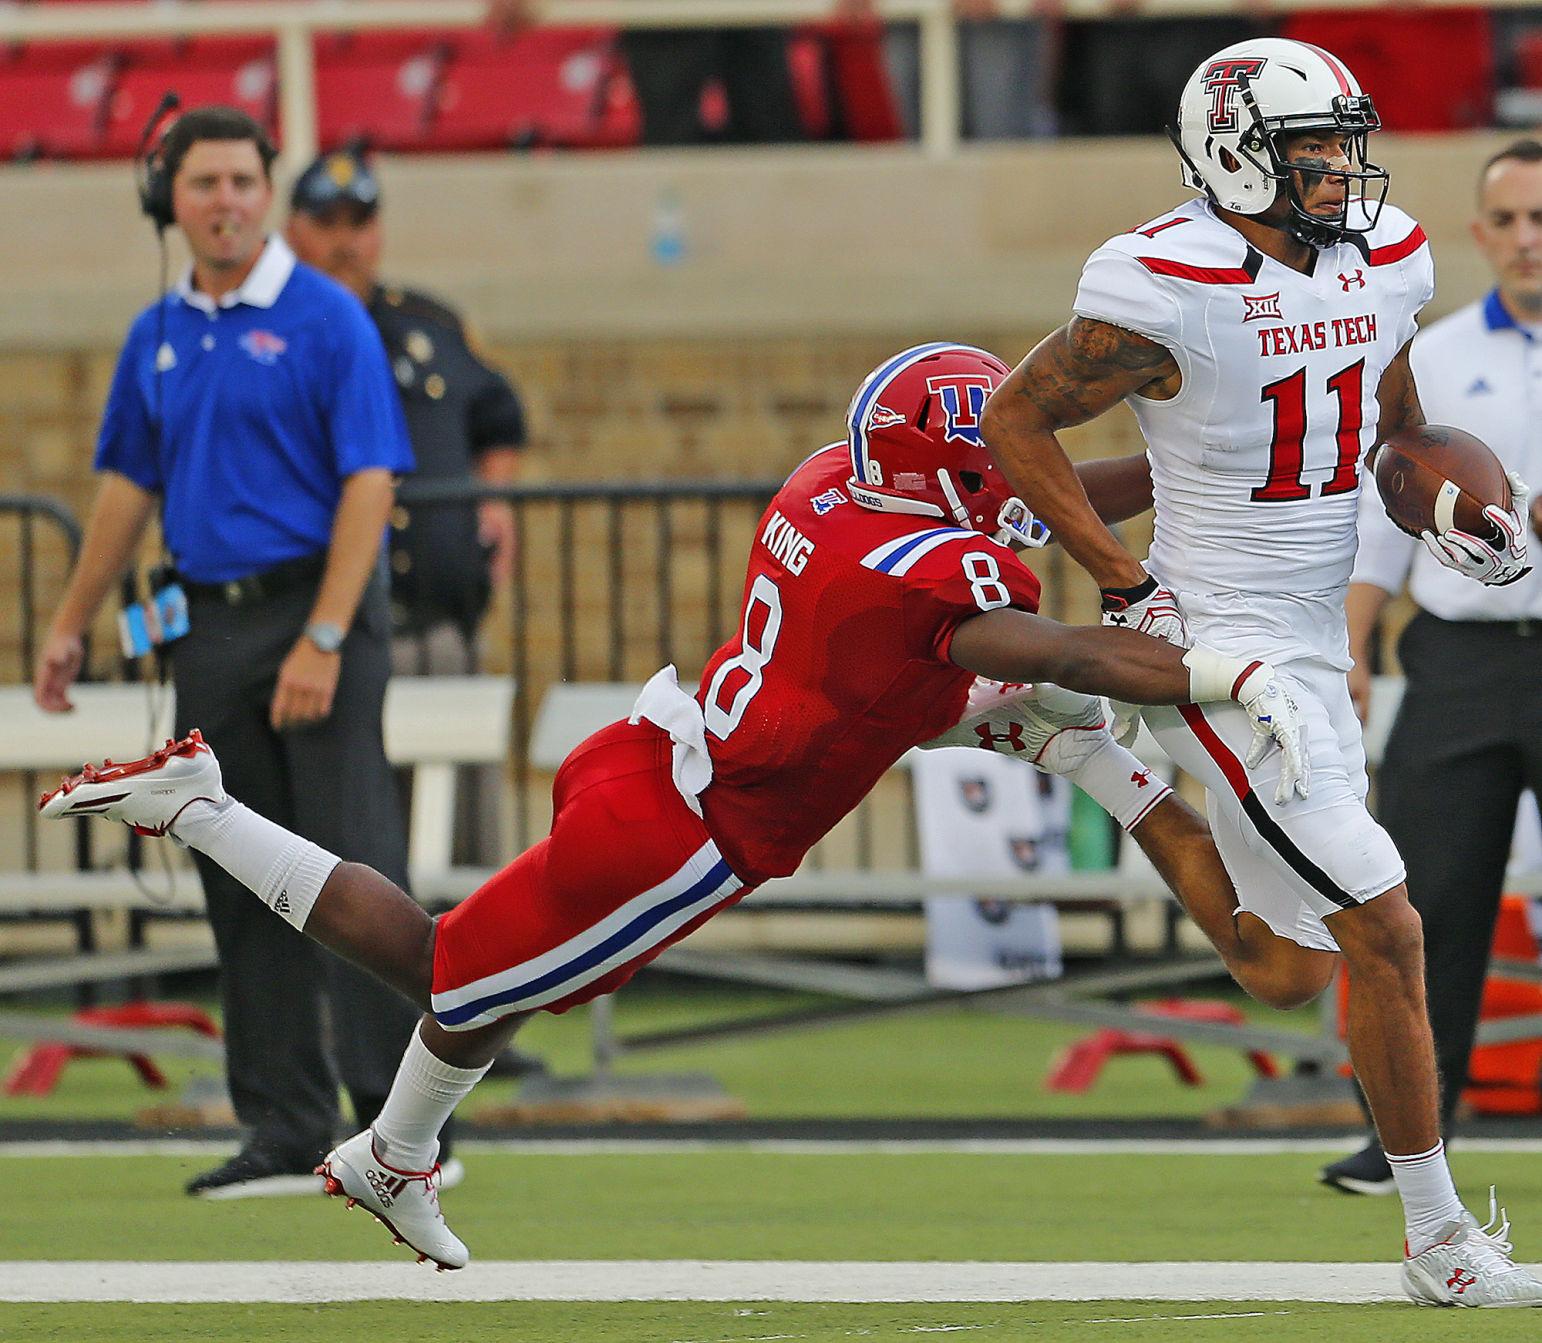 College Football Texas Tech To Open 2018 Season Vs Ole Miss Midland Reporter Telegram